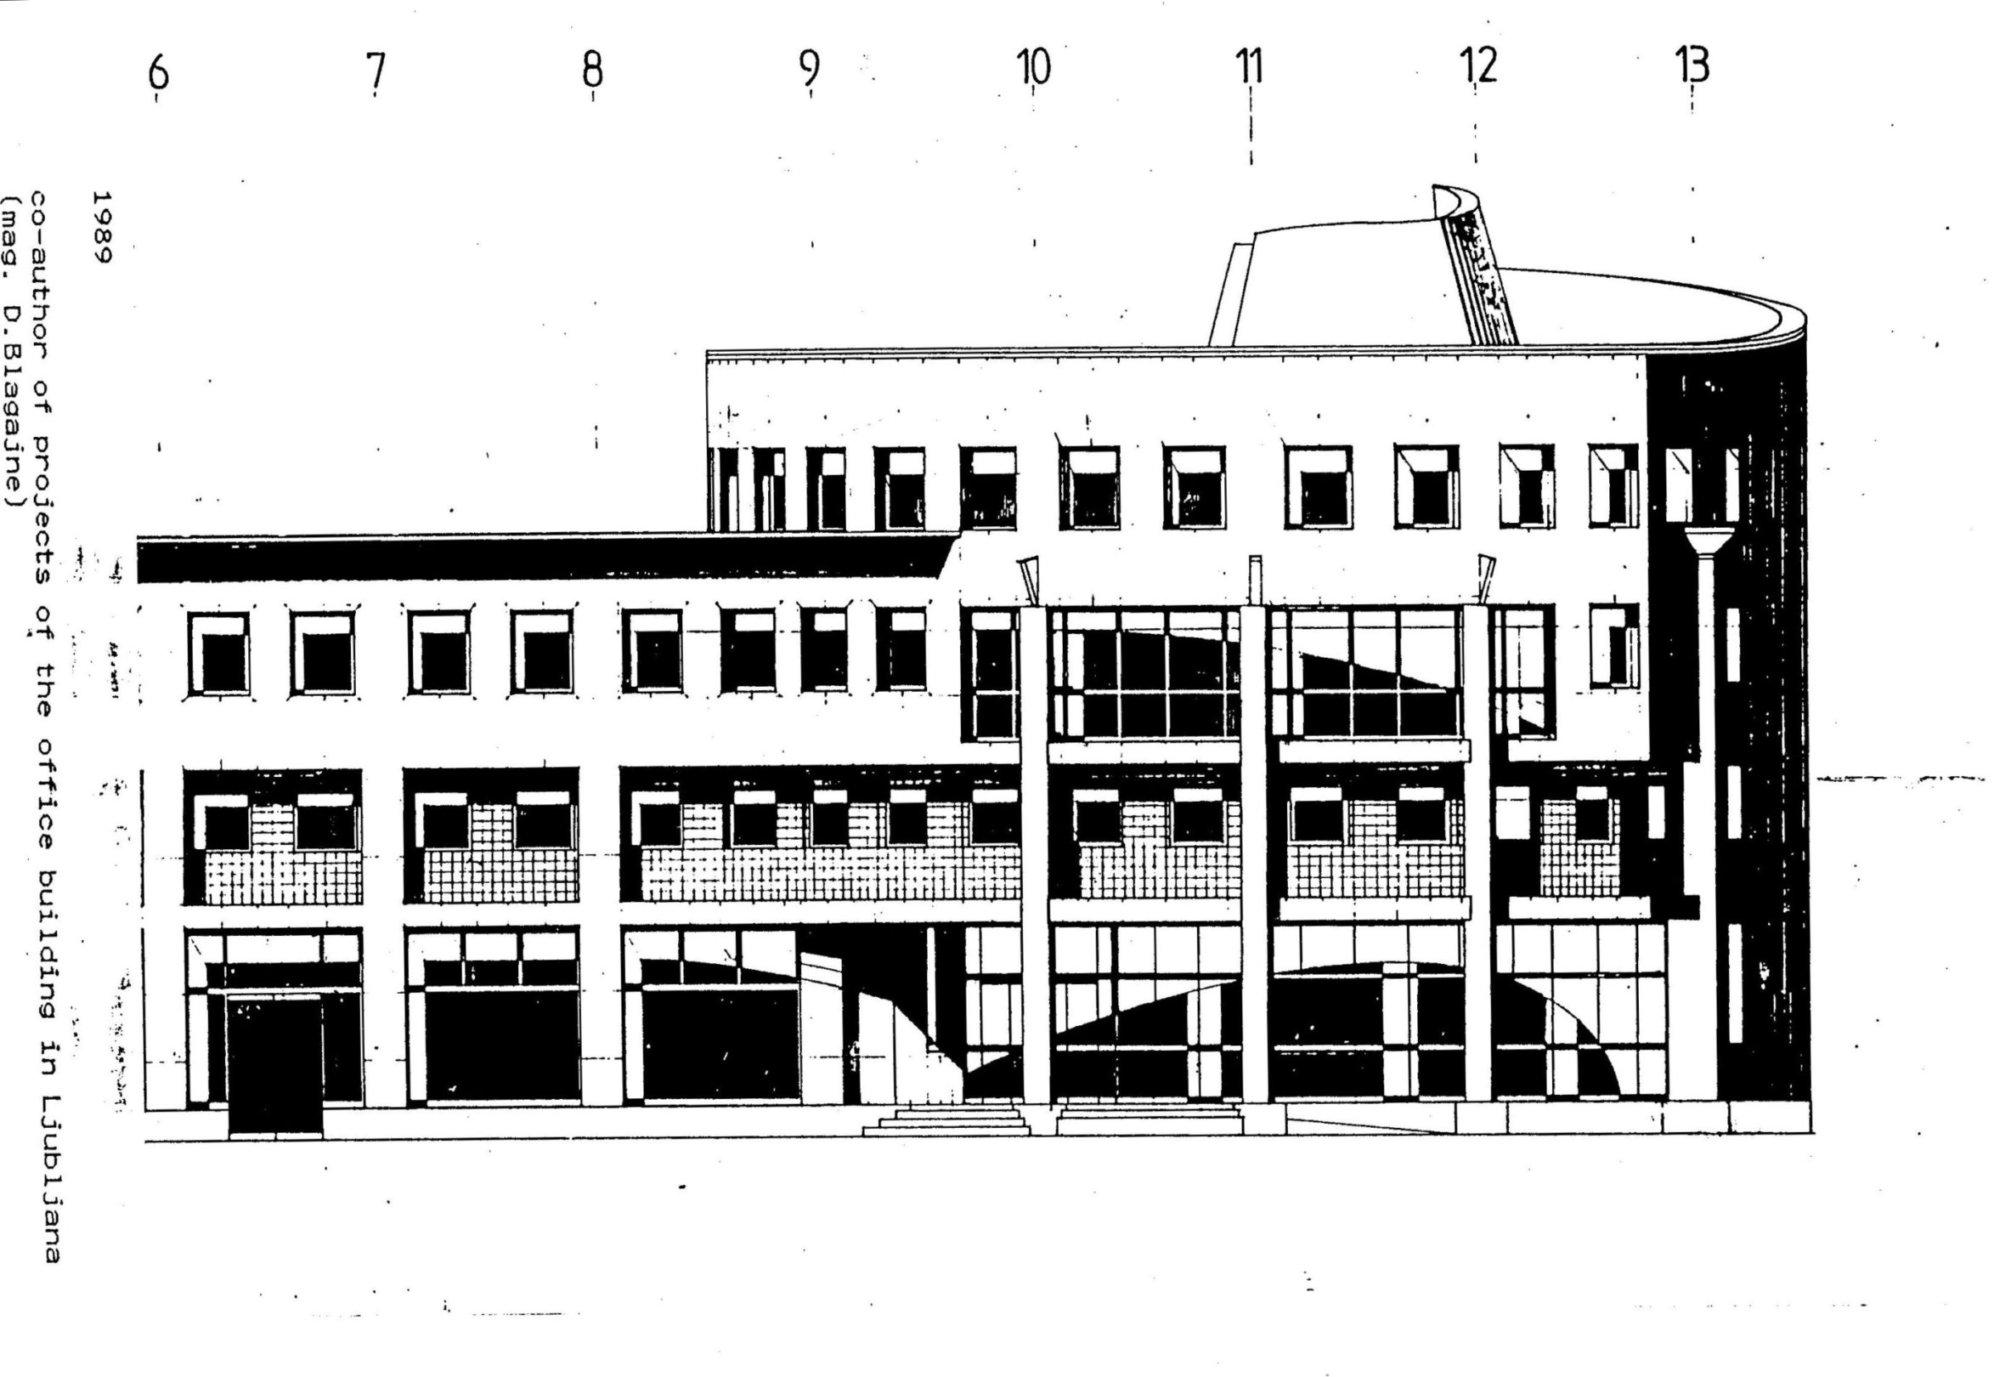 Poslovna stavba